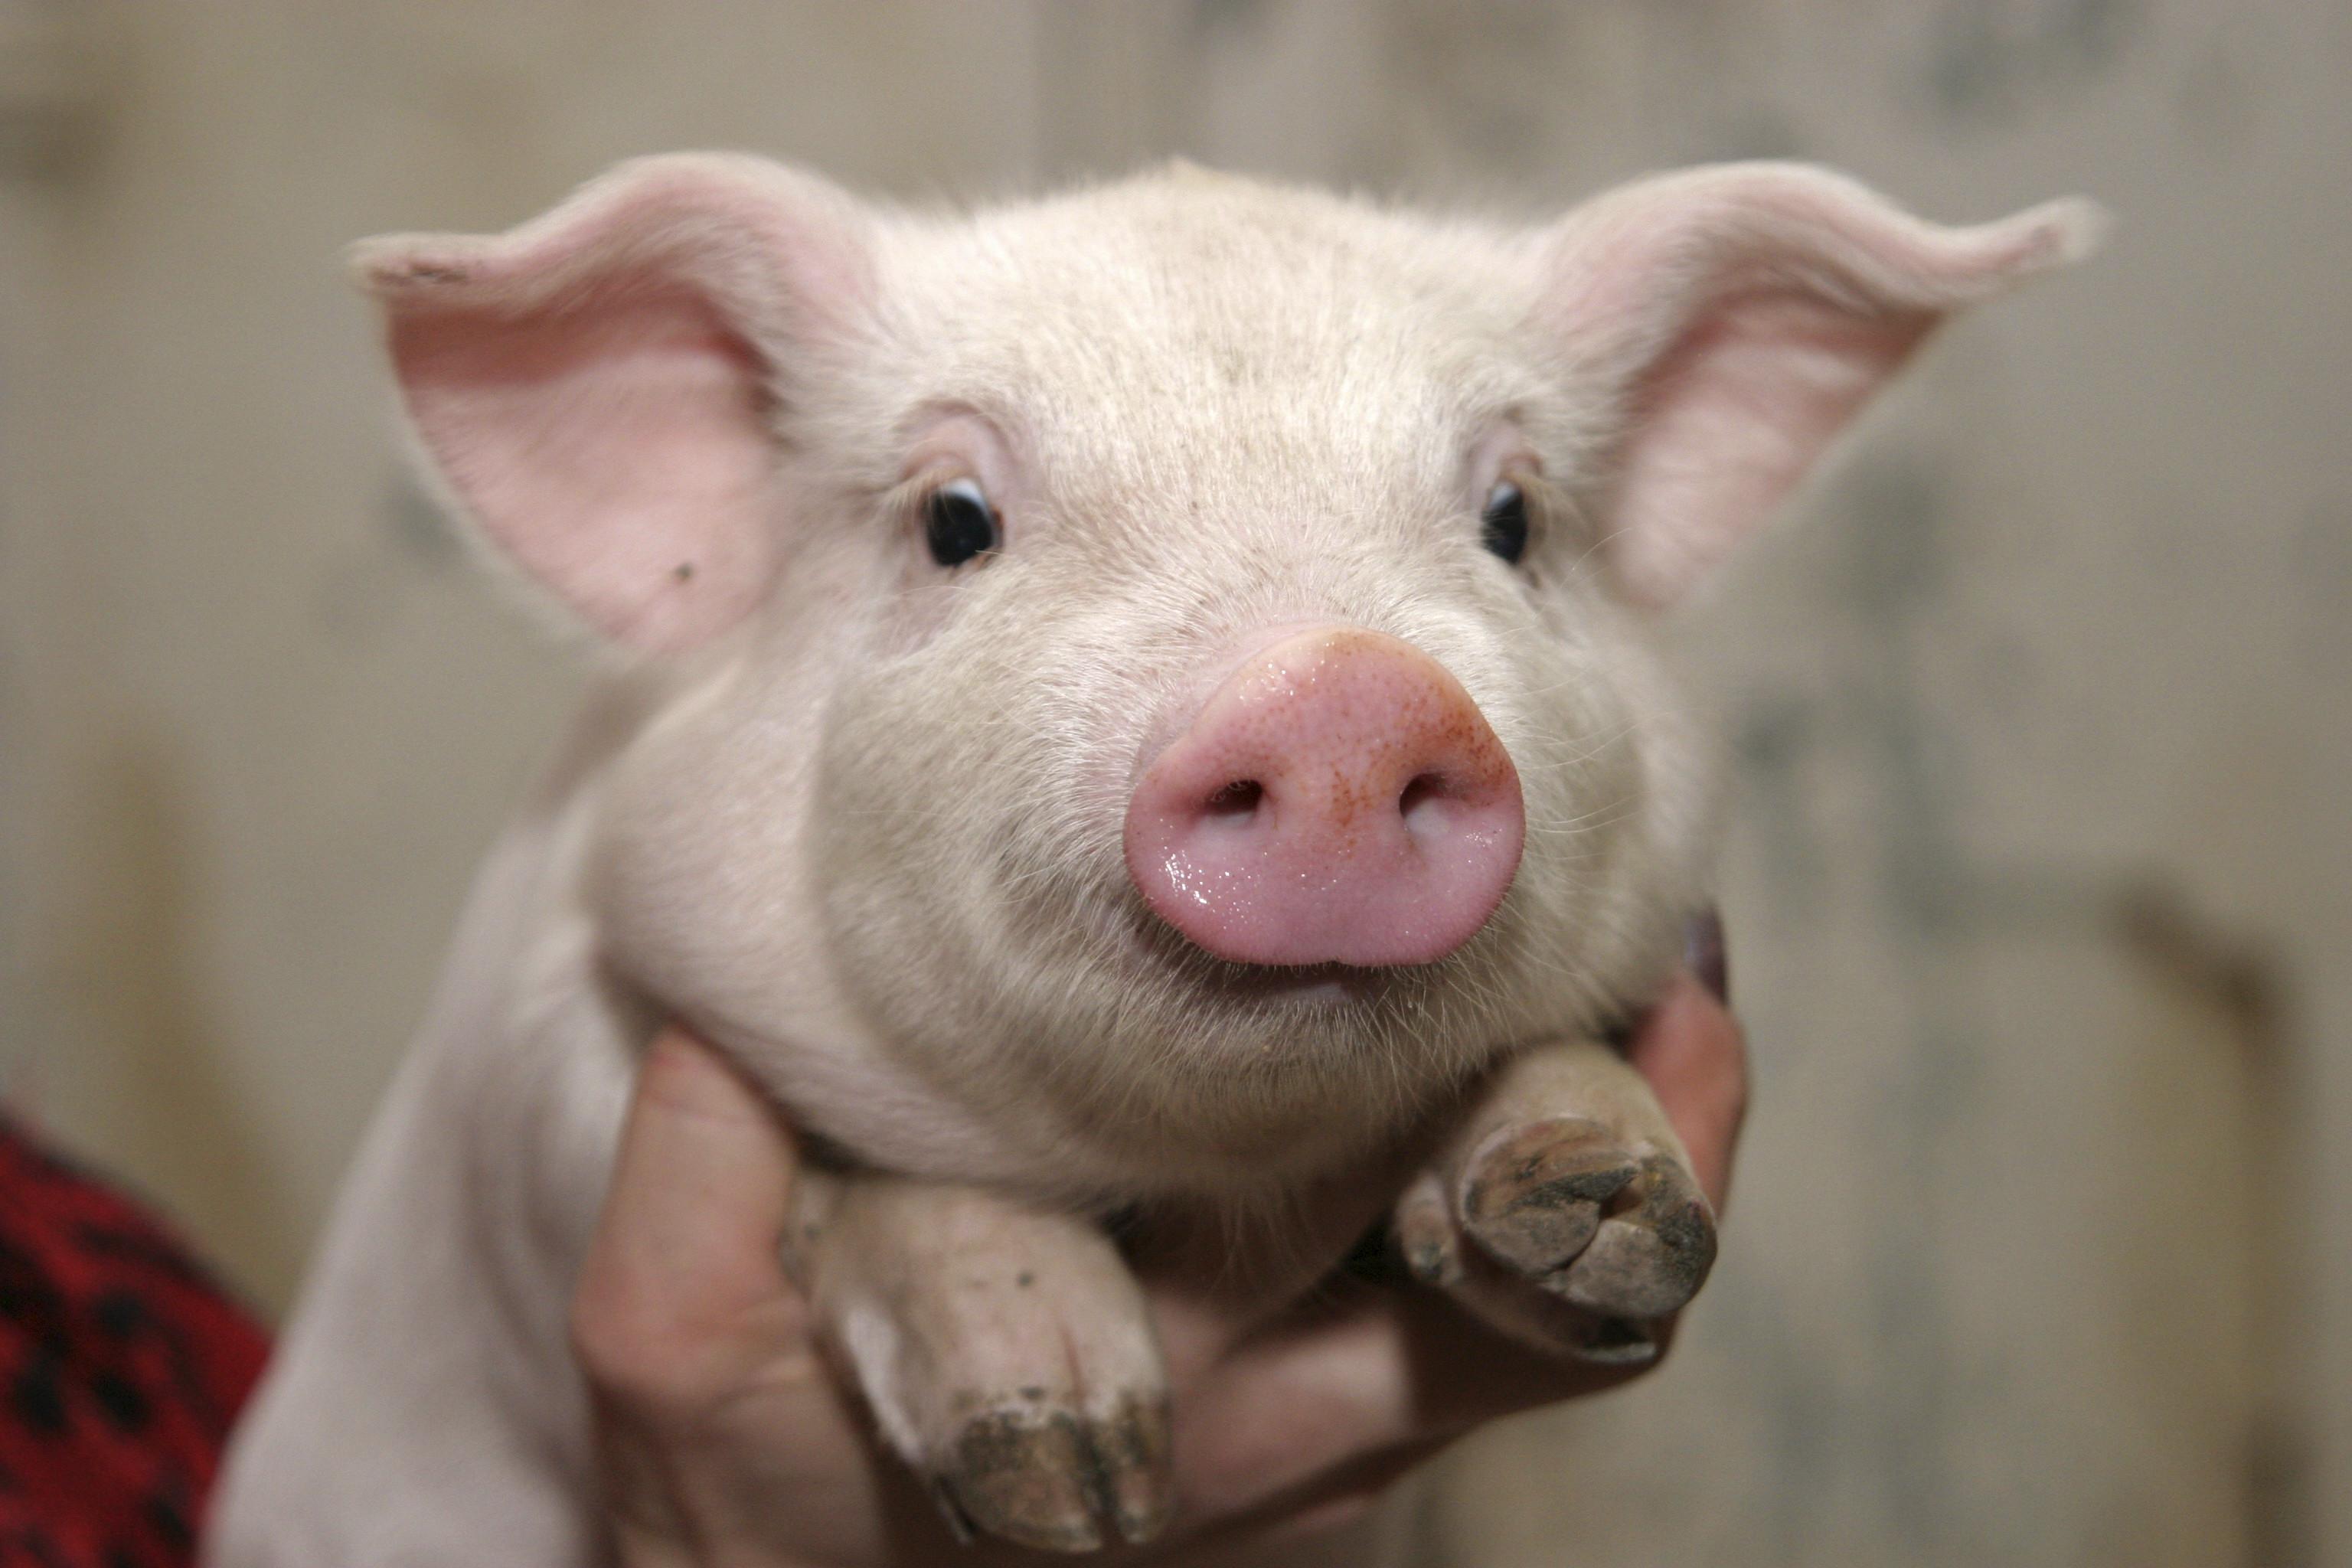 Res: 3072x2048, Pig 31